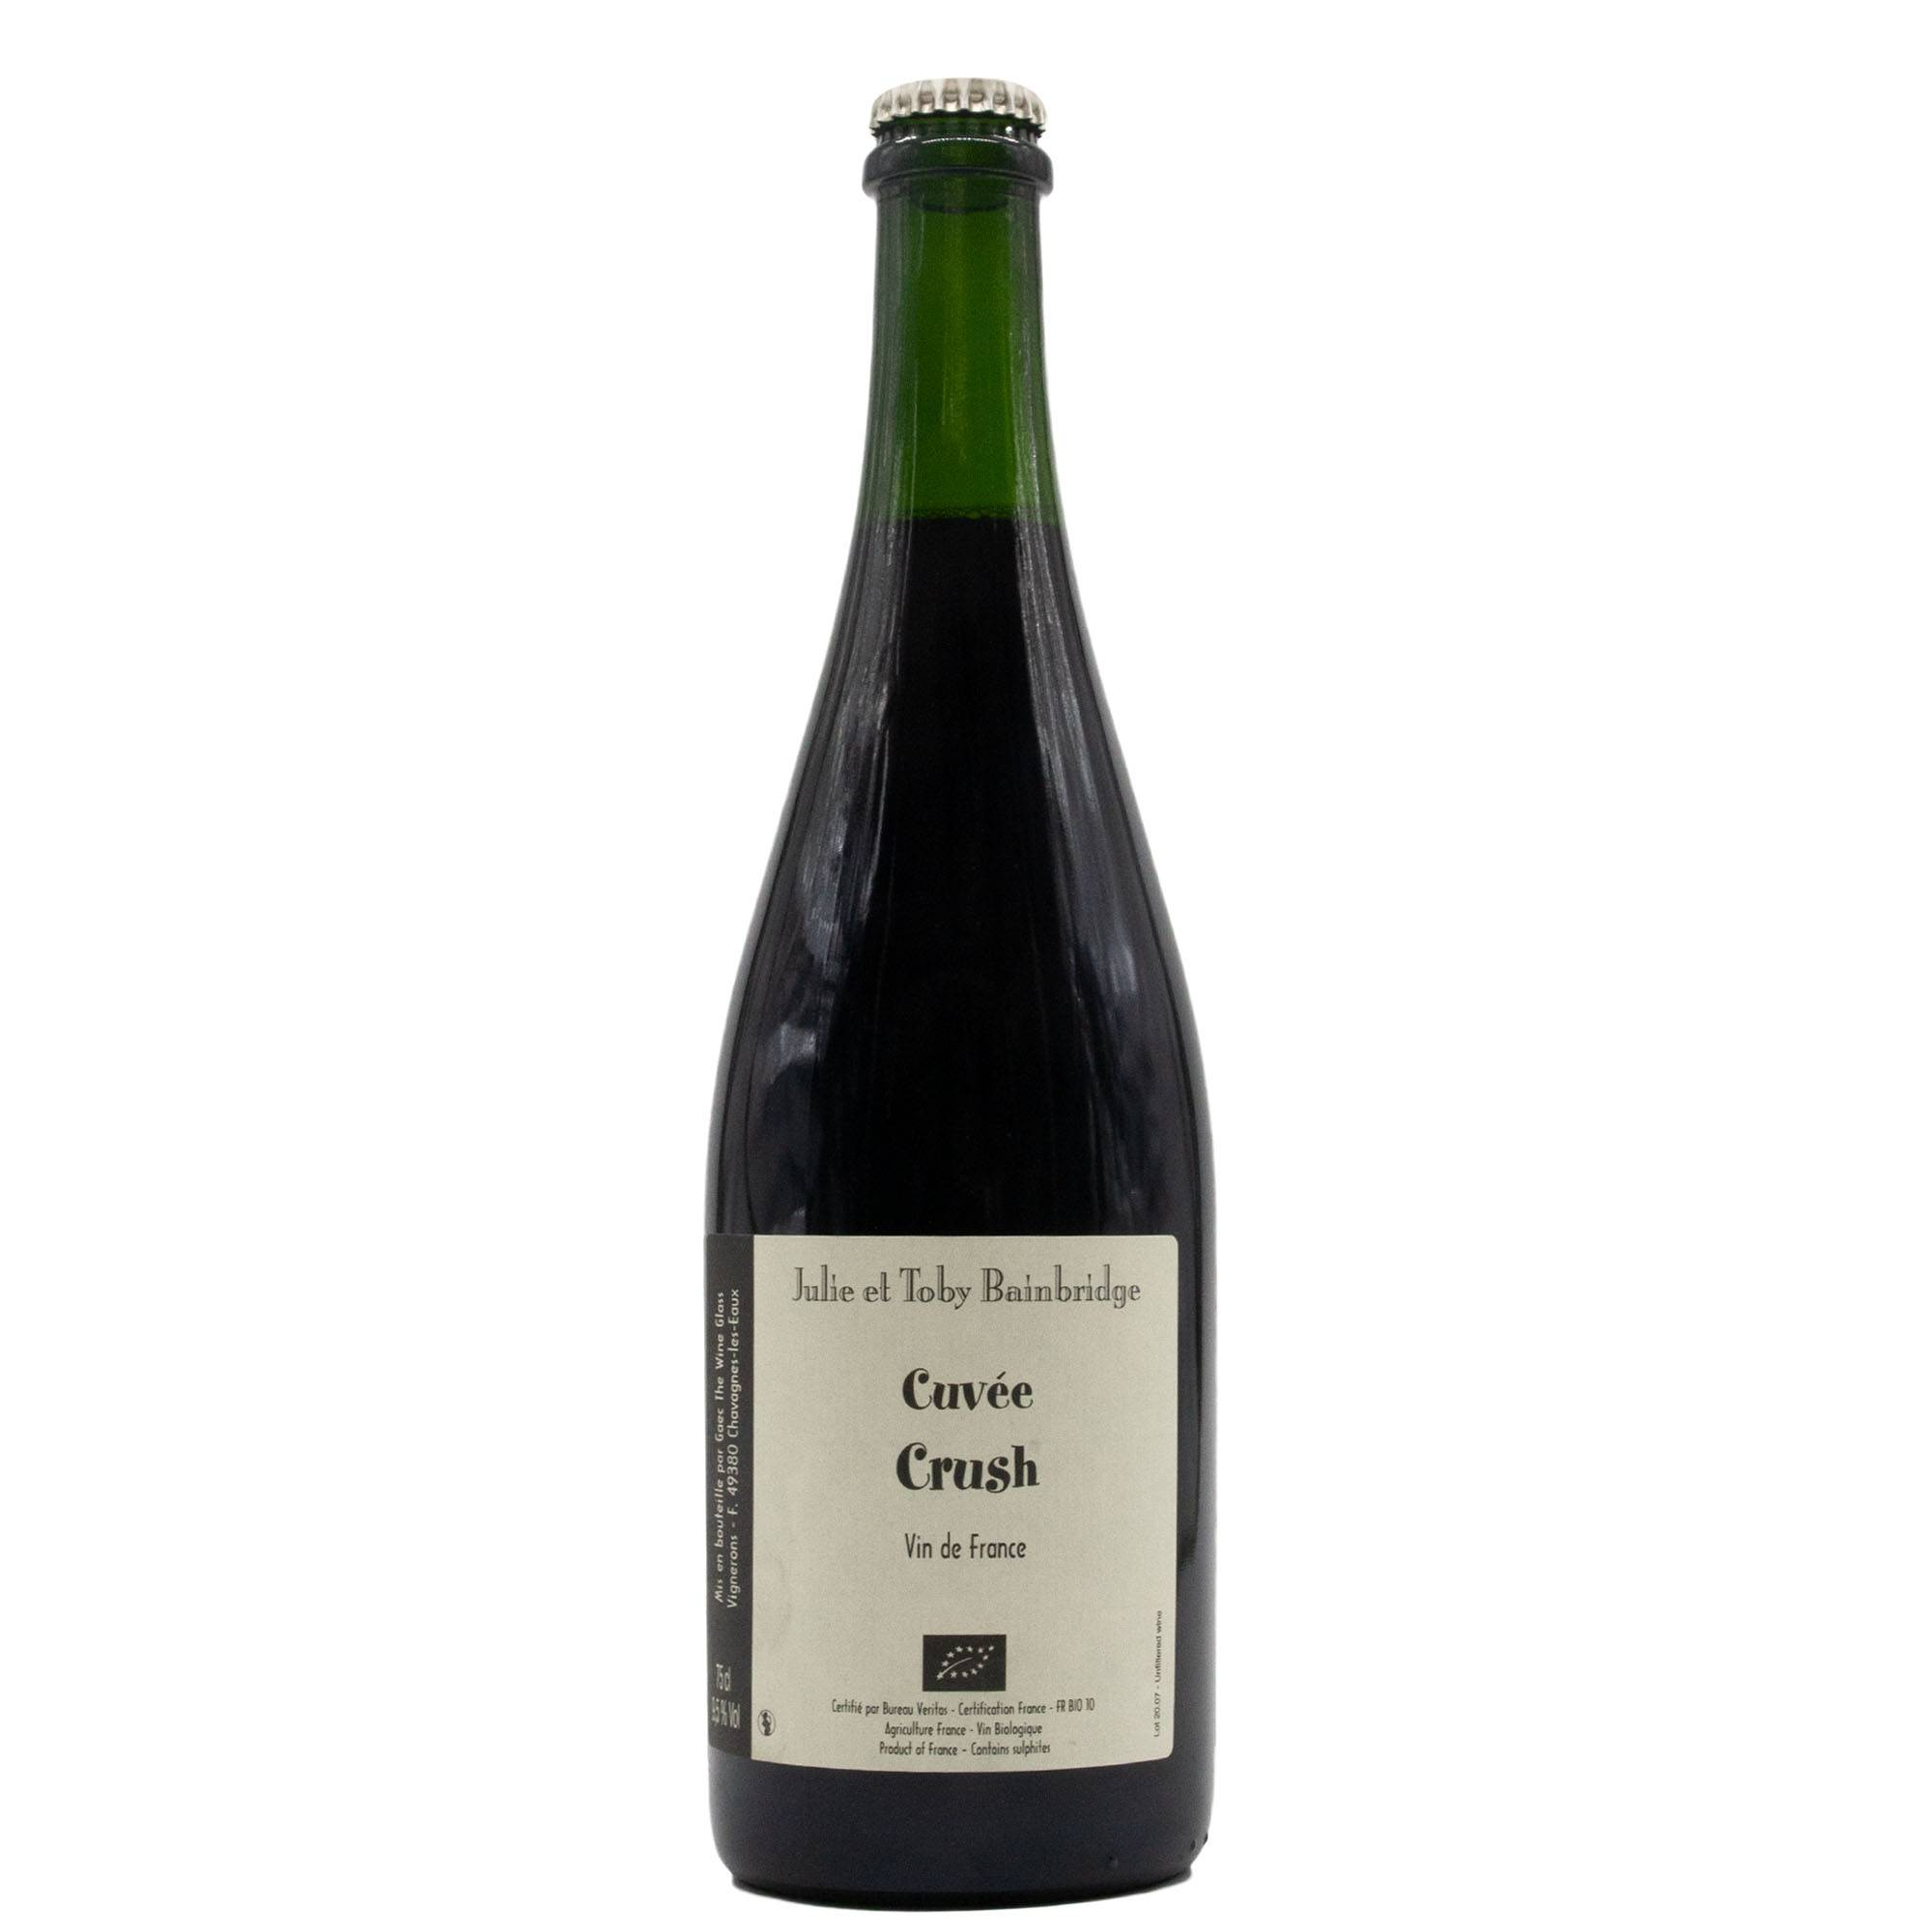 Bainbridge and Cathcart Vin De France Crush